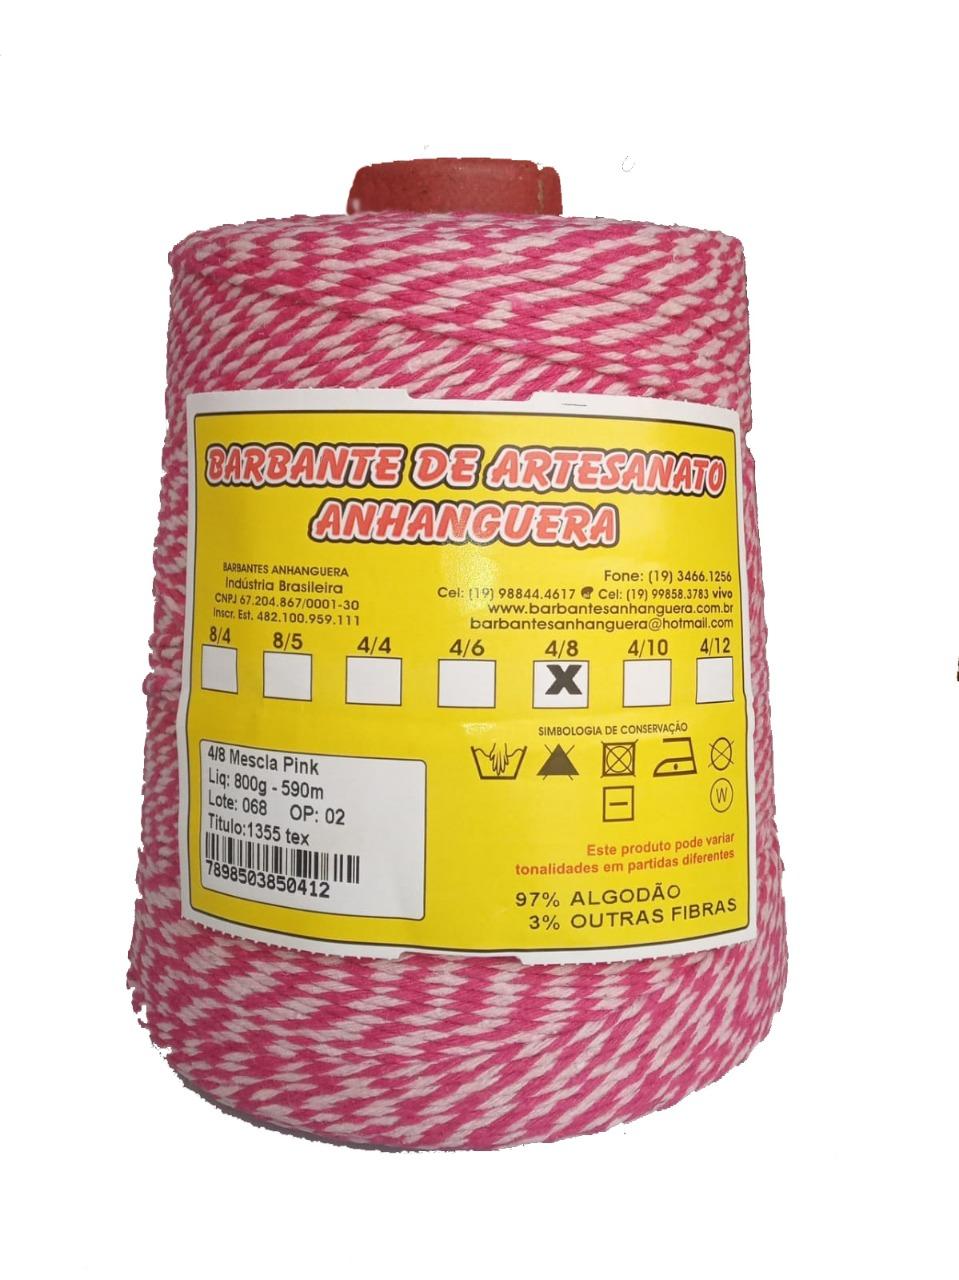 Barbante 4/8 800g 590m Mescla Pink - Anhanguera